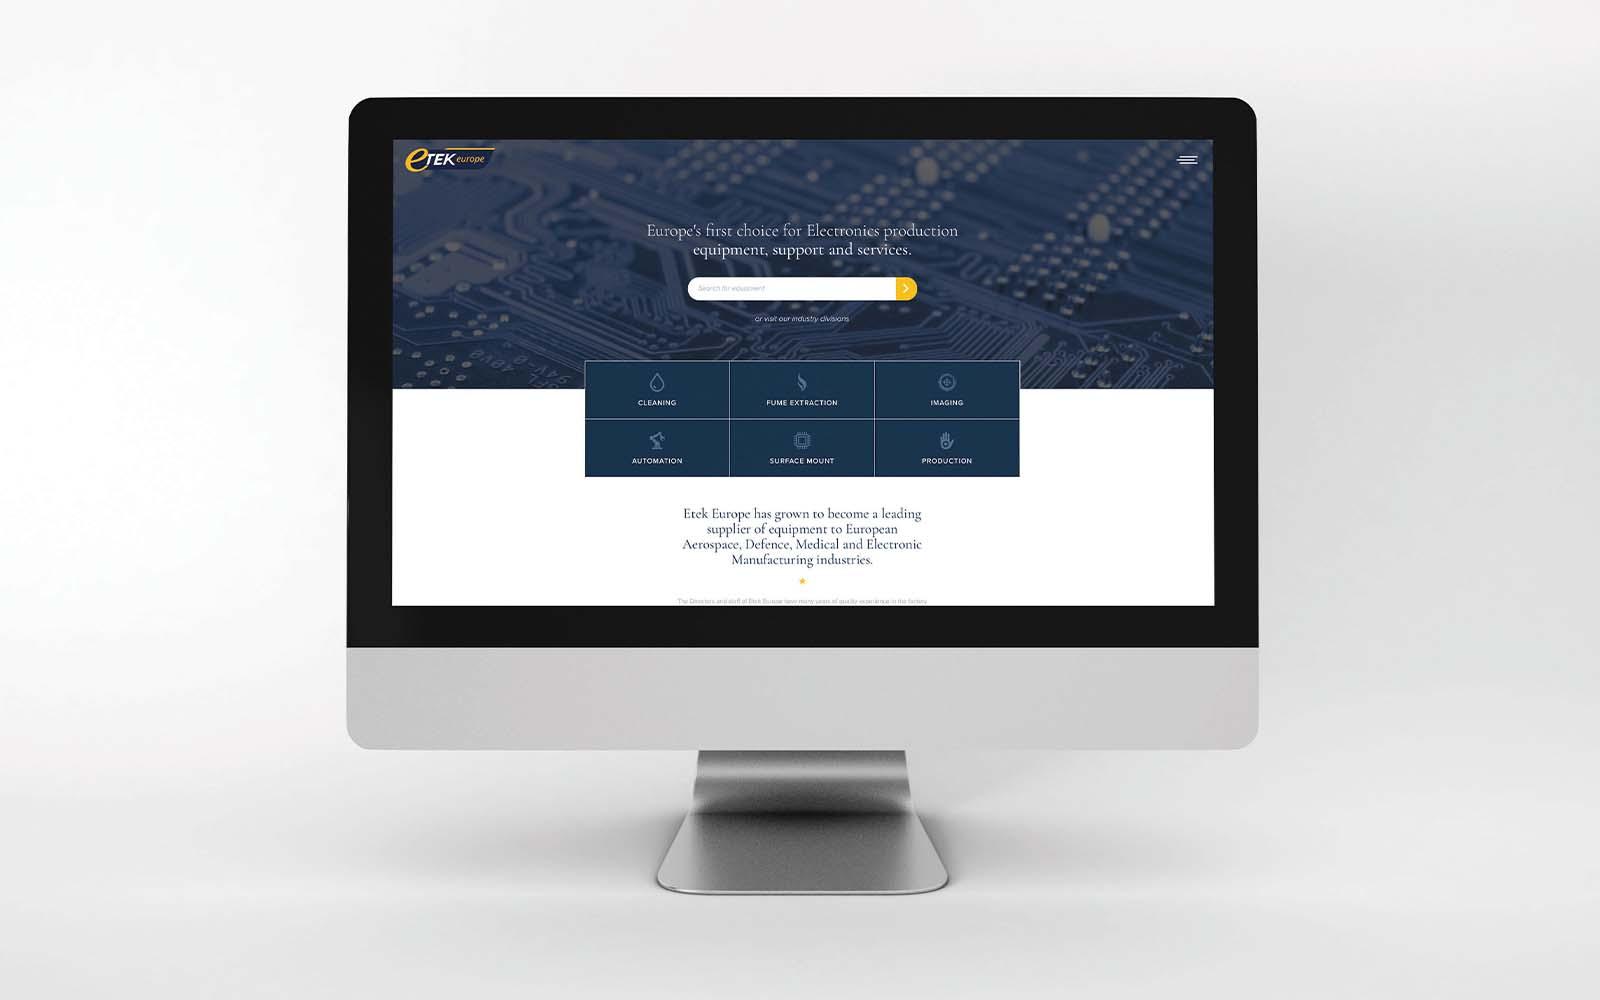 Etek Europe website design